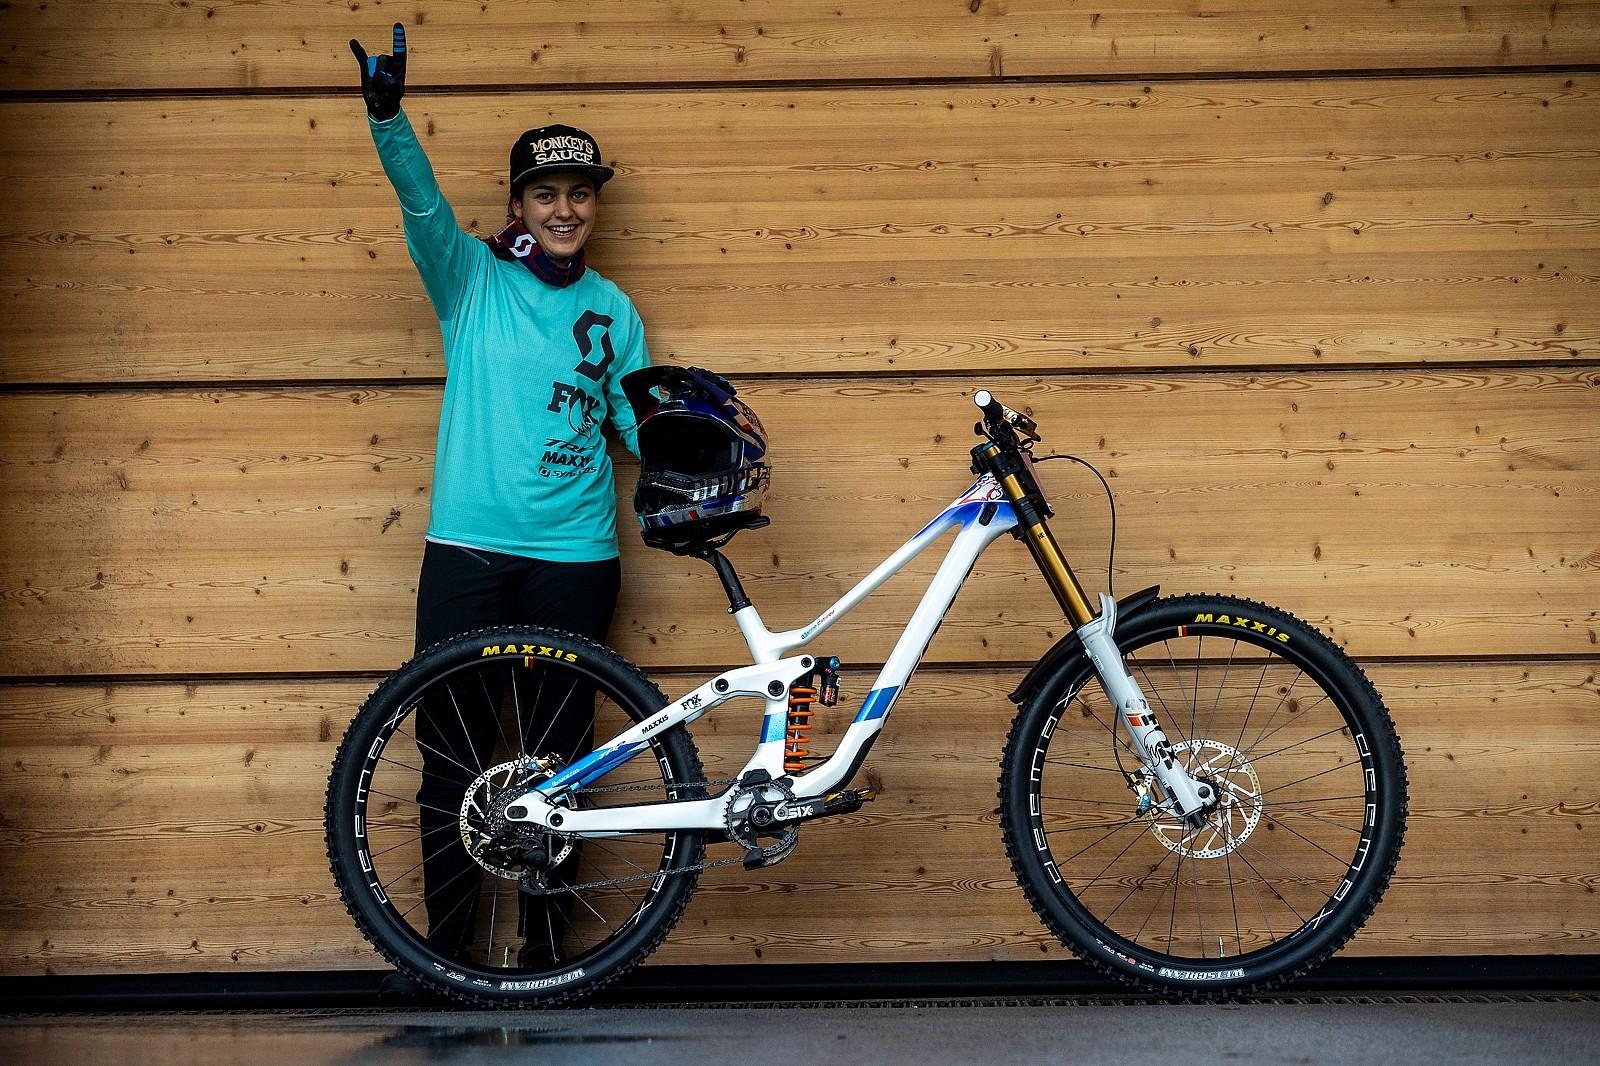 WORLD CHAMPS BIKE - Marine Cabirou's Scott Gambler - WORLD CHAMPS BIKE - Marine Cabirou's Scott Gambler - Mountain Biking Pictures - Vital MTB